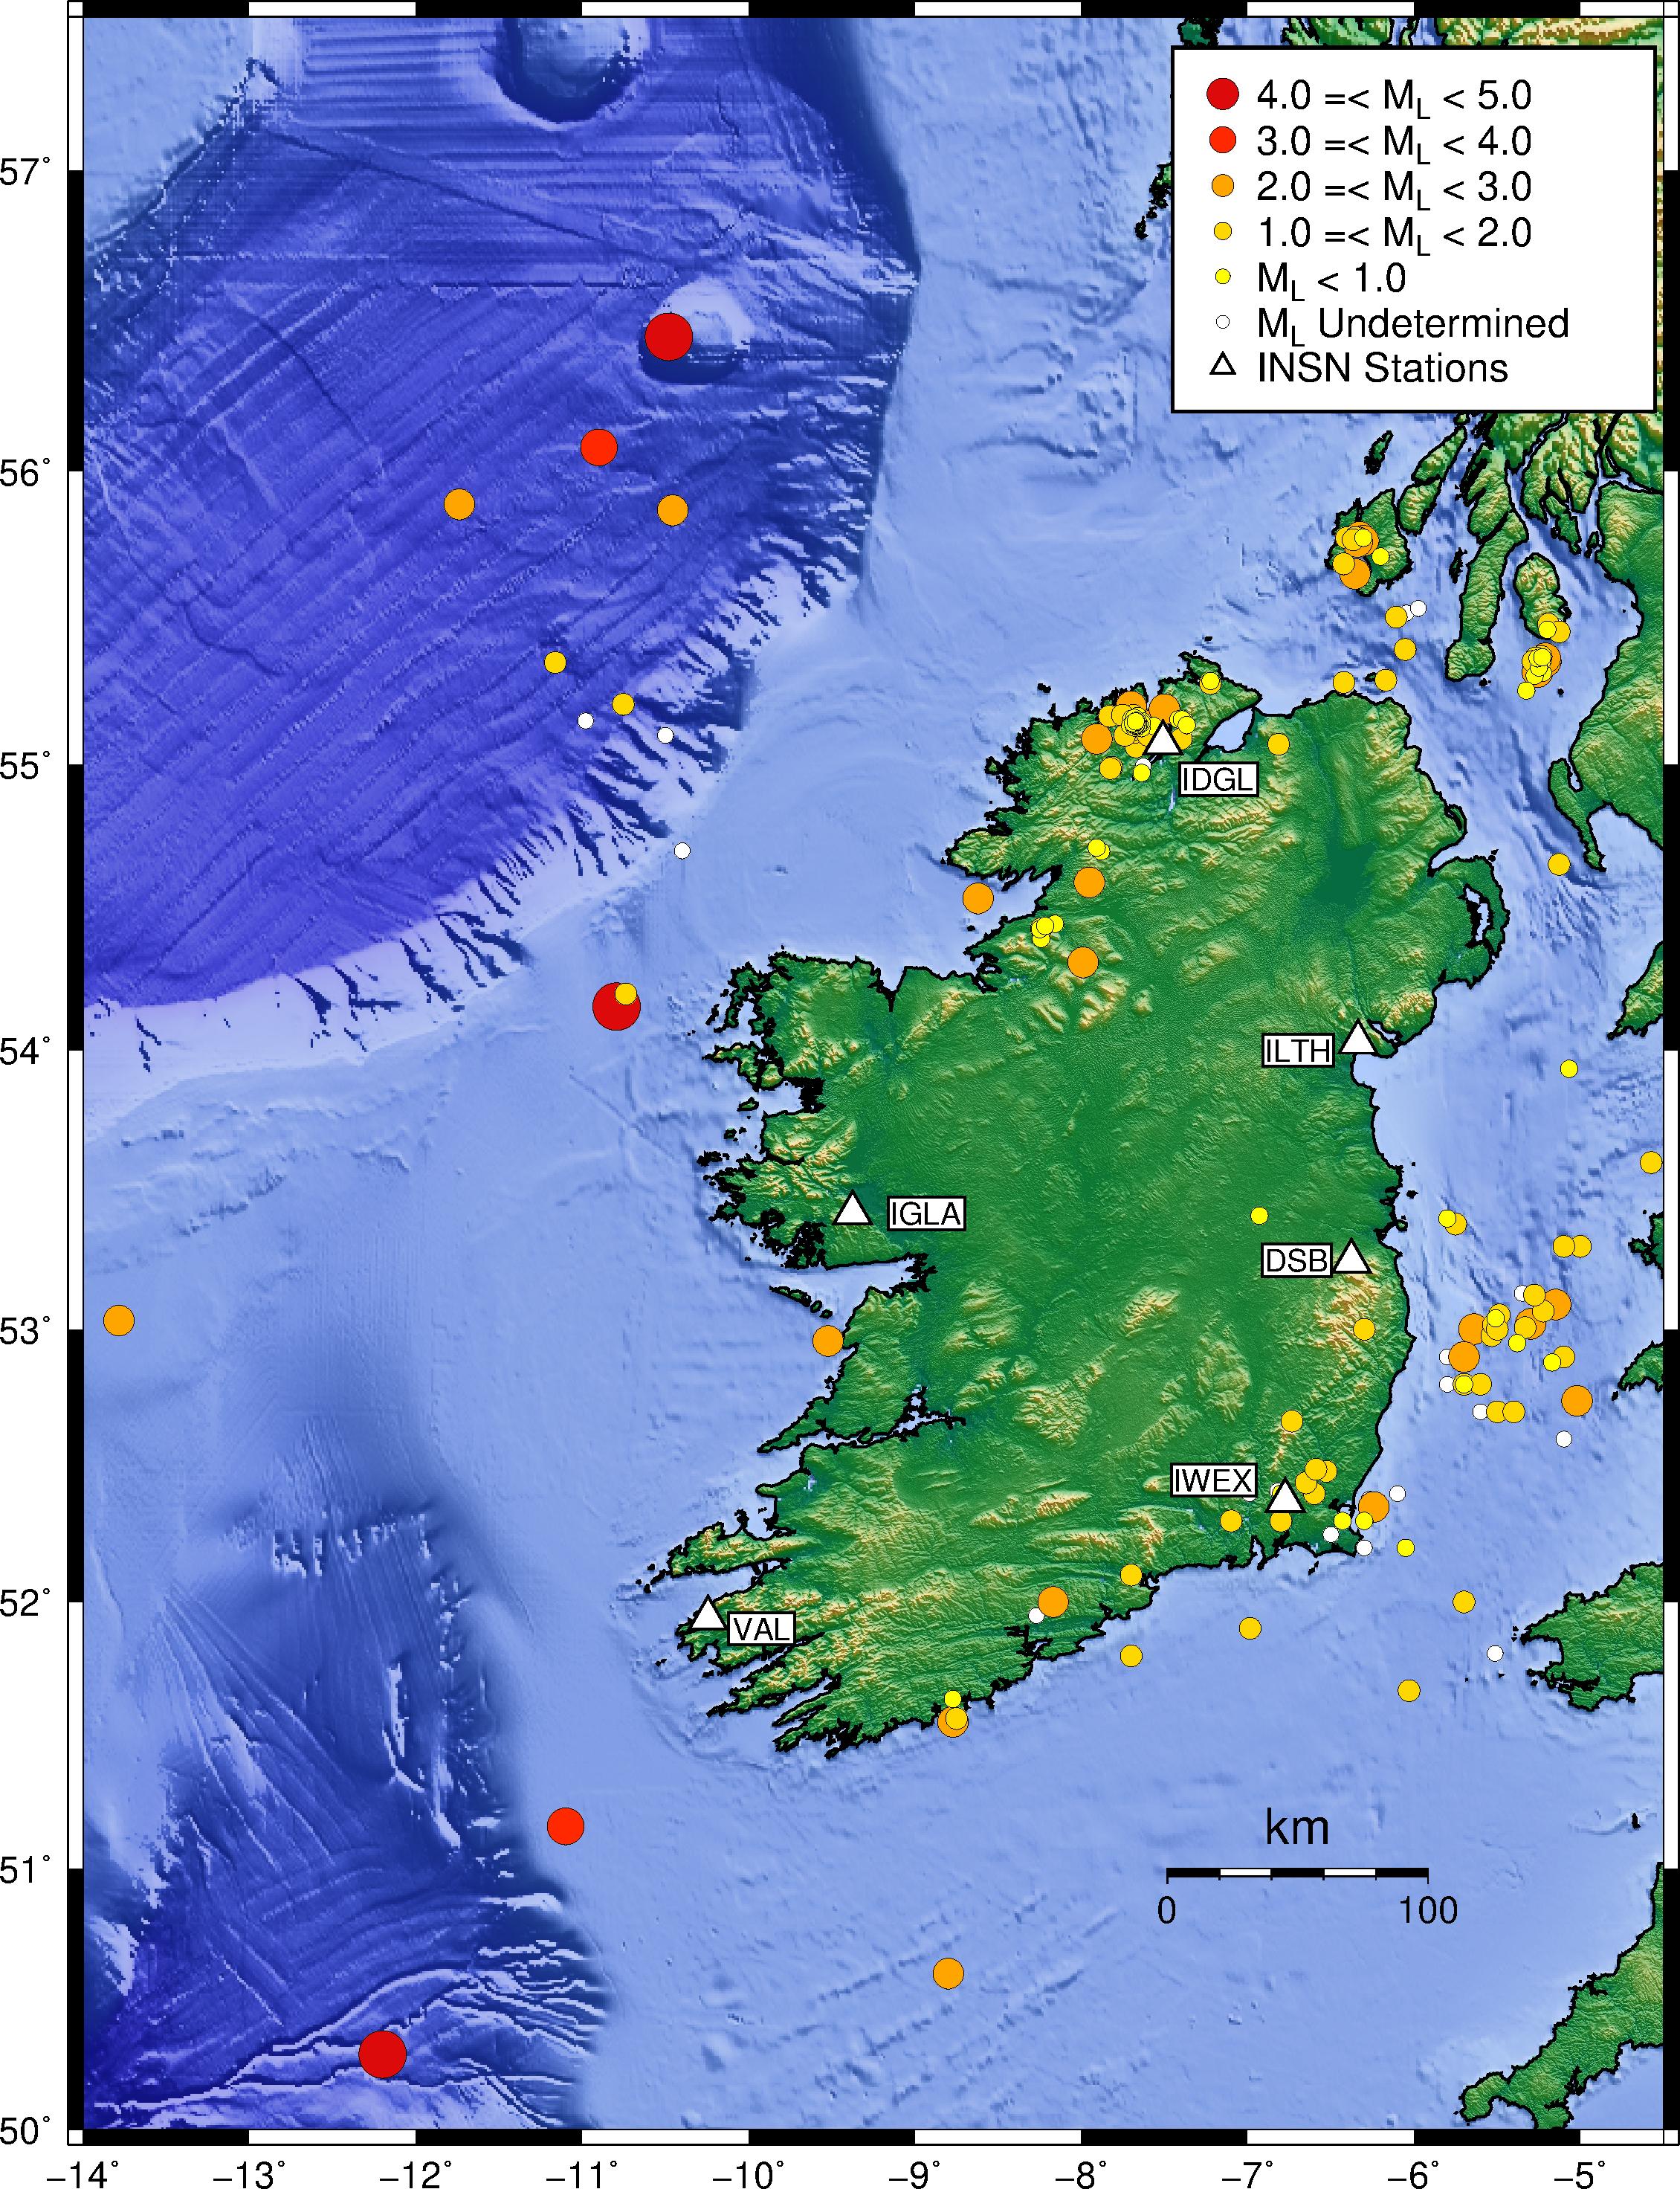 Irish National Seismic Network (INSN)